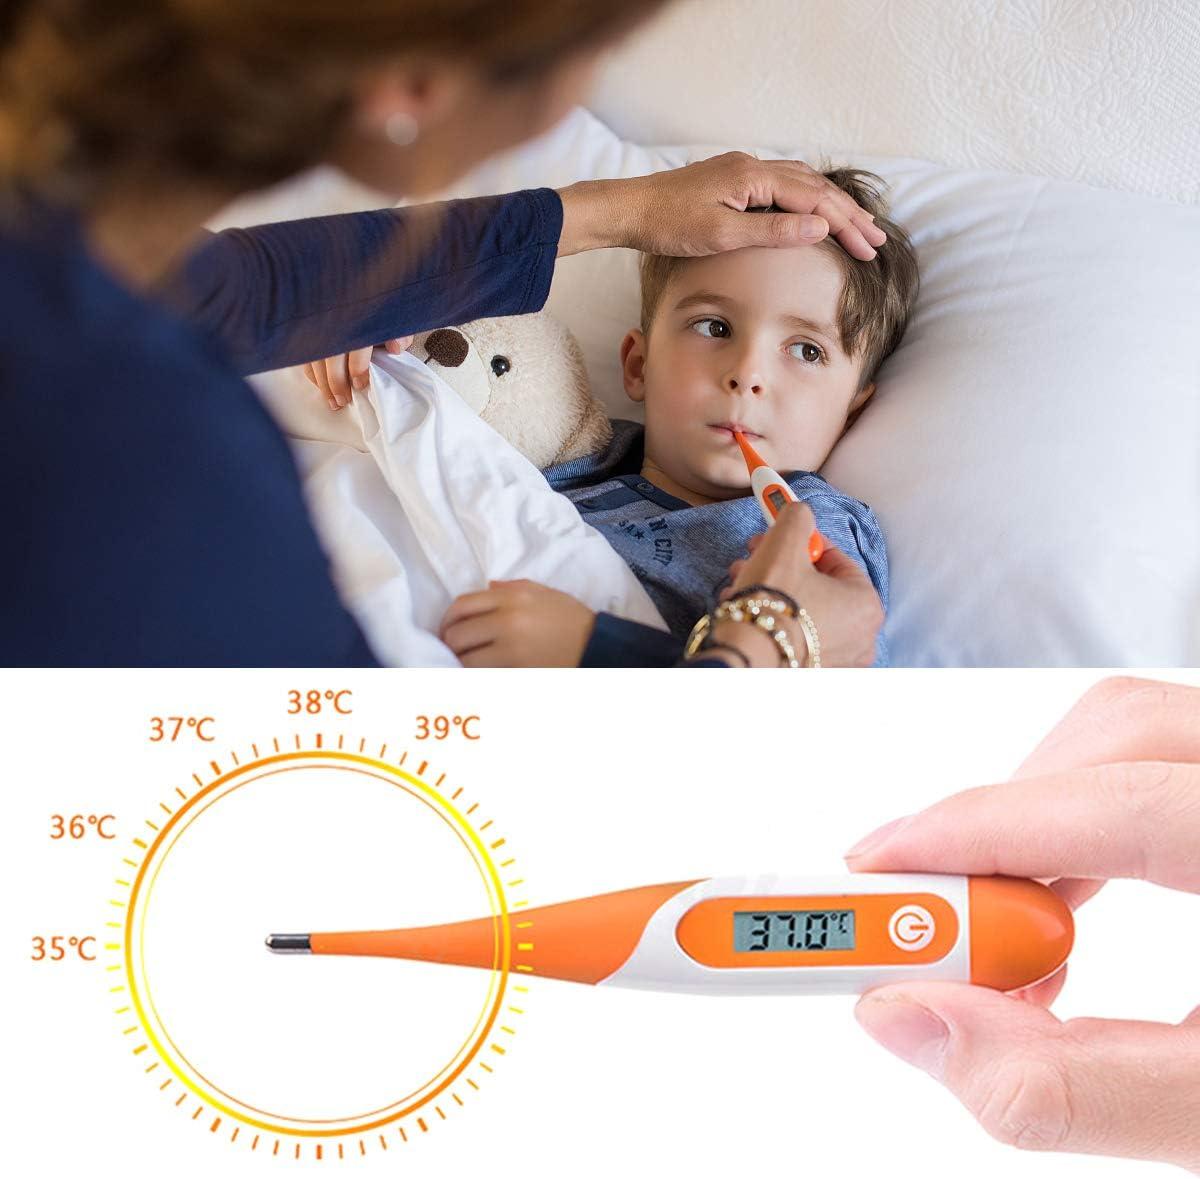 DERCLIVE Digitales Medizinisches Thermometer Baby Kinder Flexible Spitze Mundh/öhle Temperaturmesser